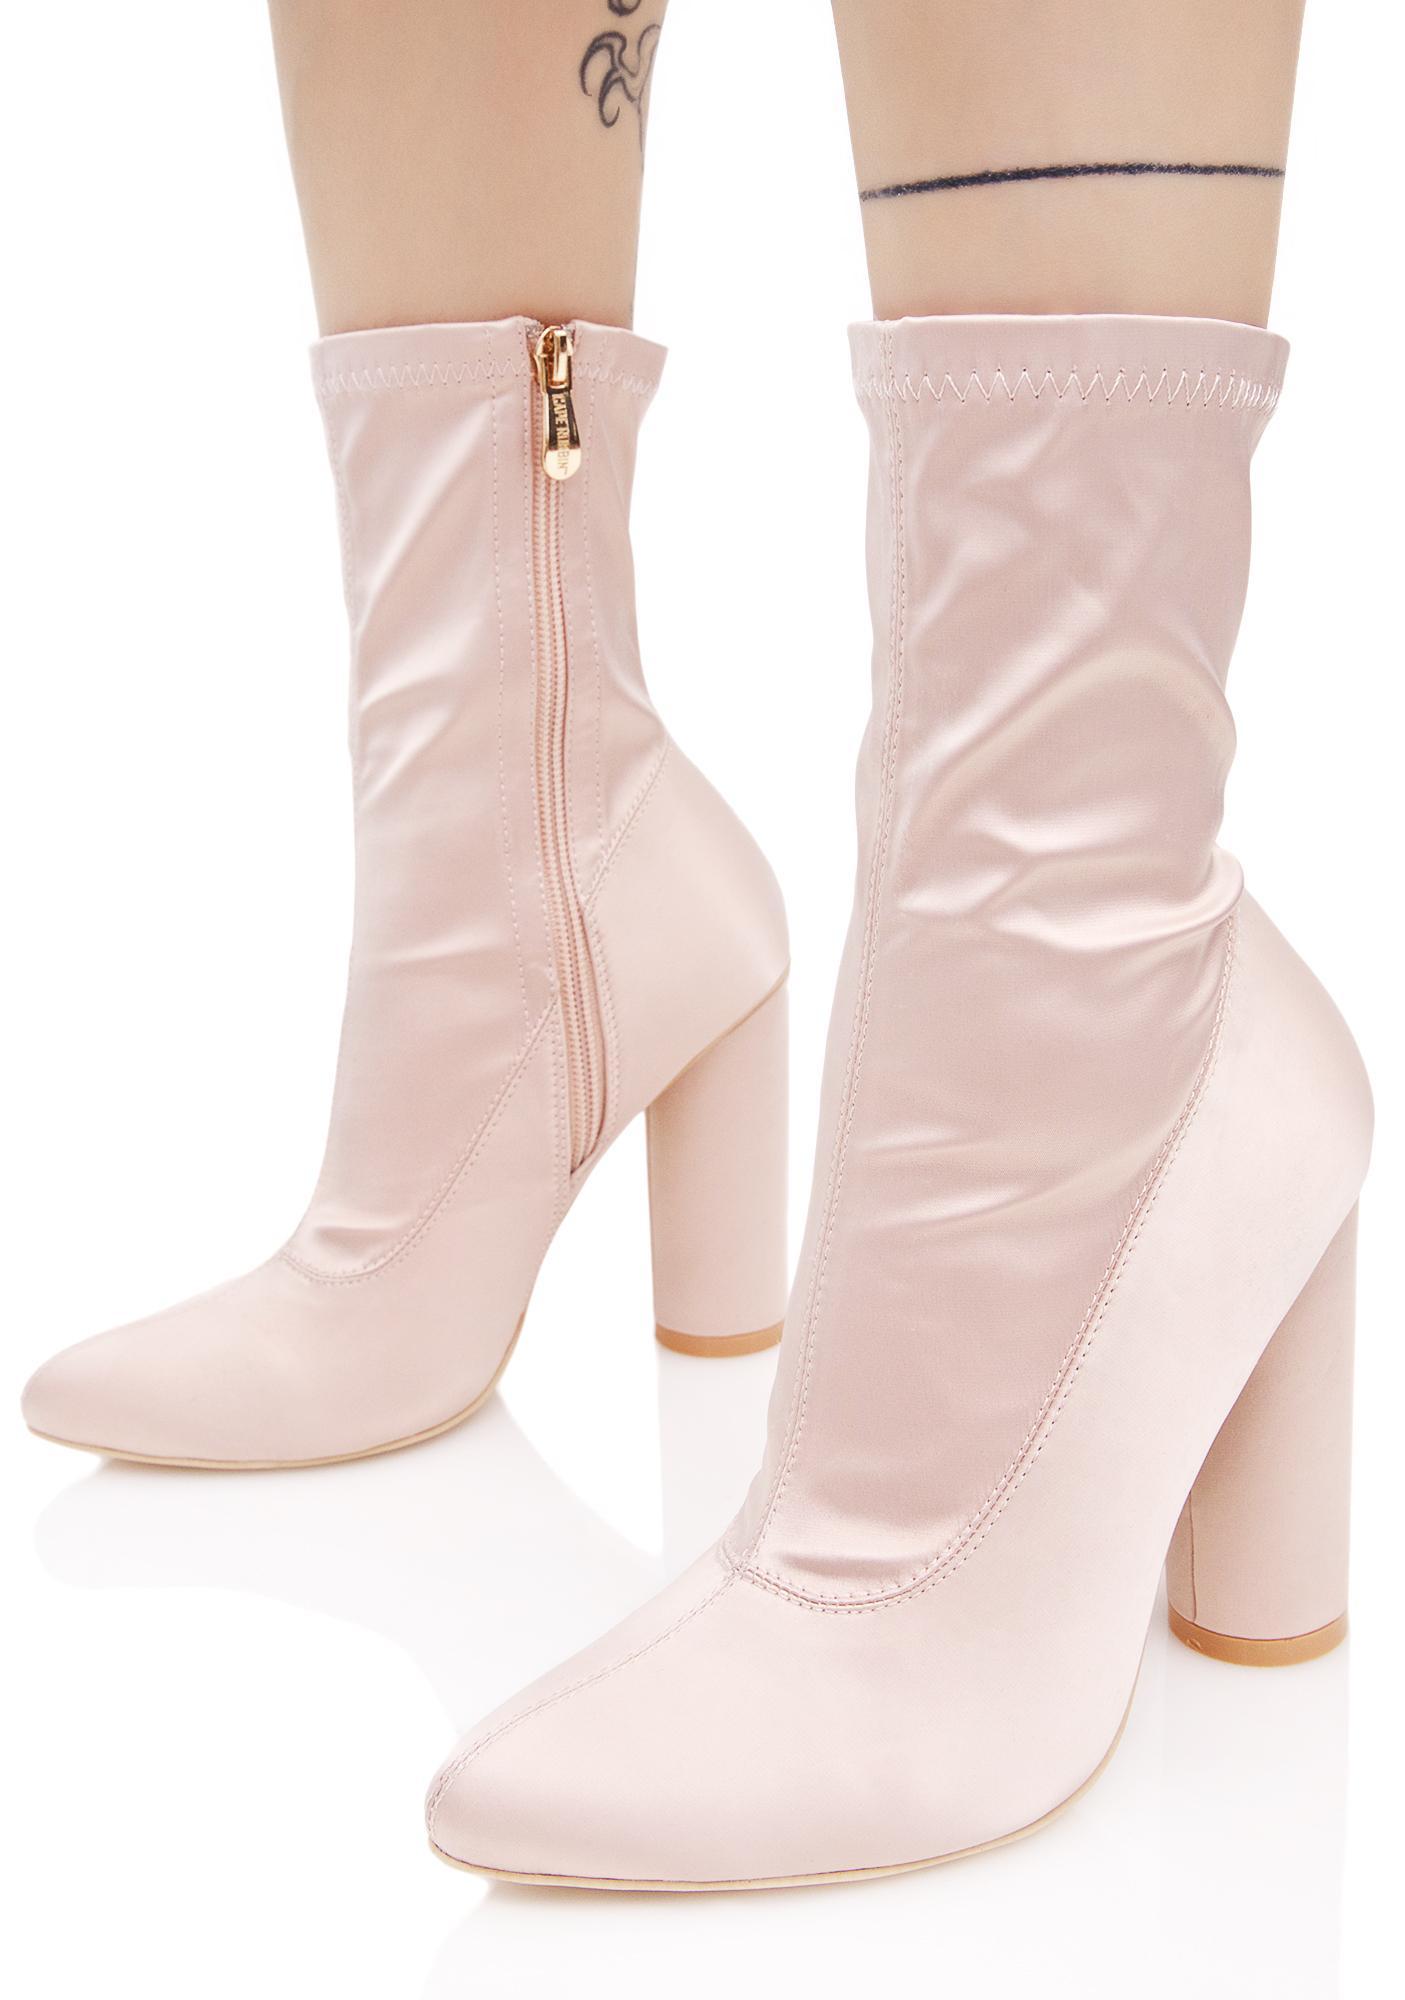 Seraphim Satin Boots